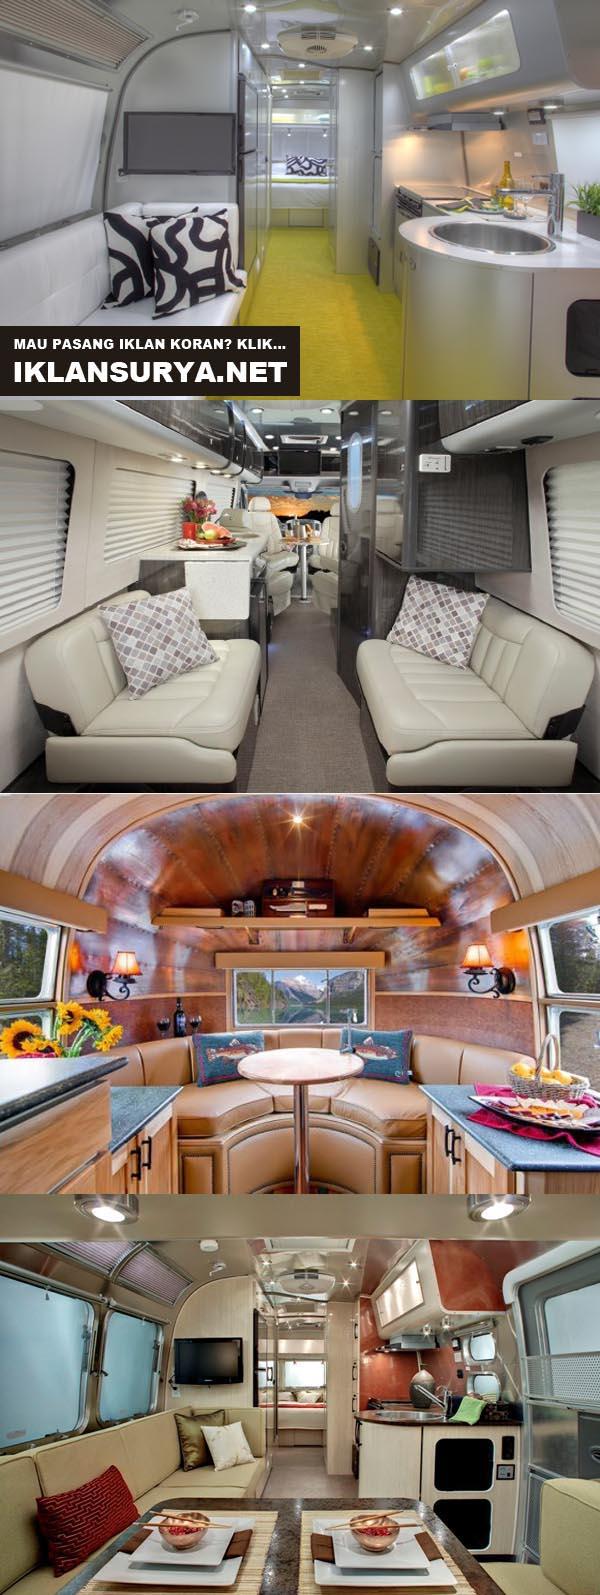 karavan super mewah